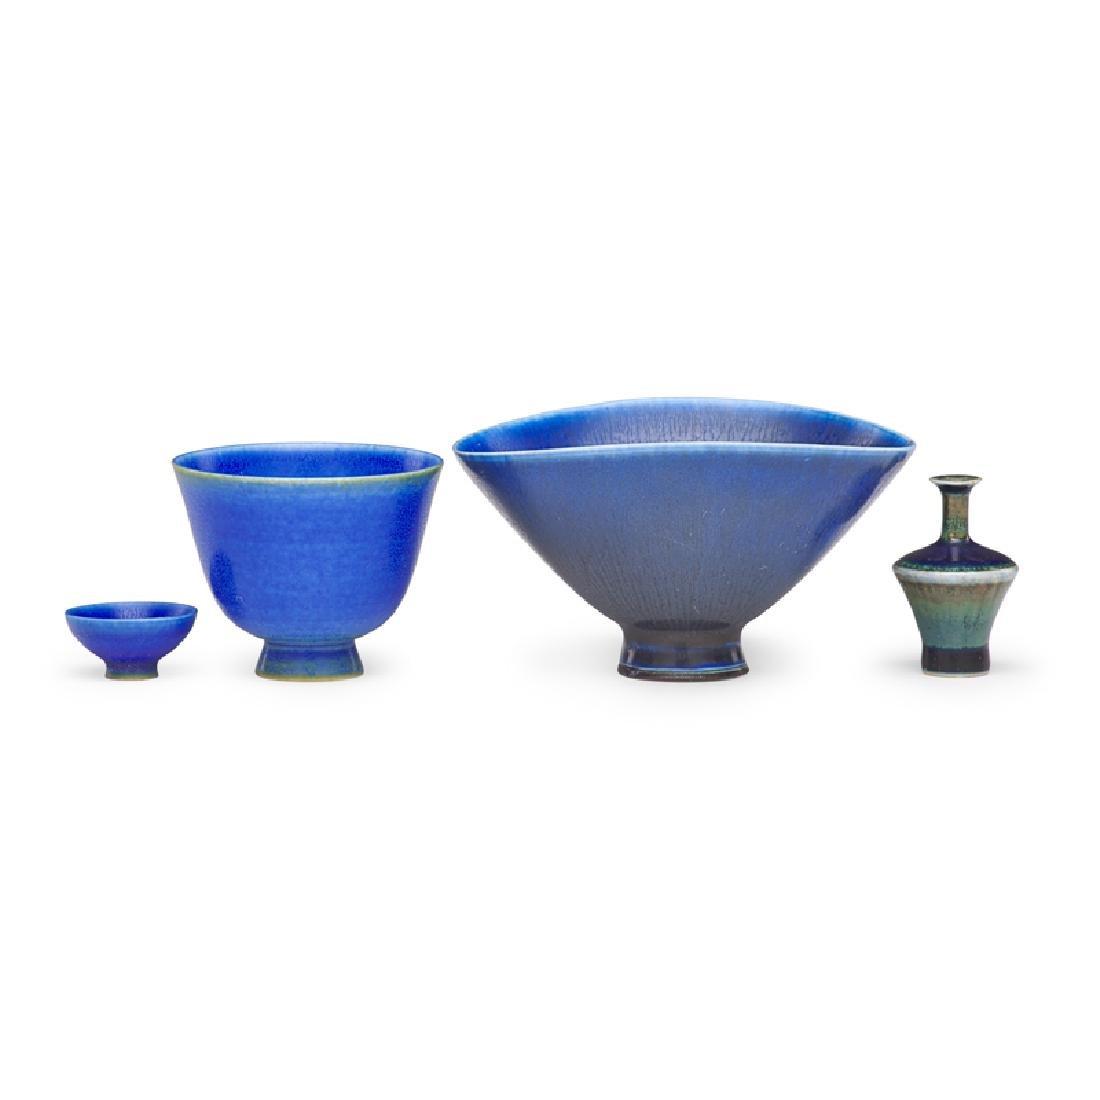 BERNDT FRIBERG ETC. Four miniature vases - 3